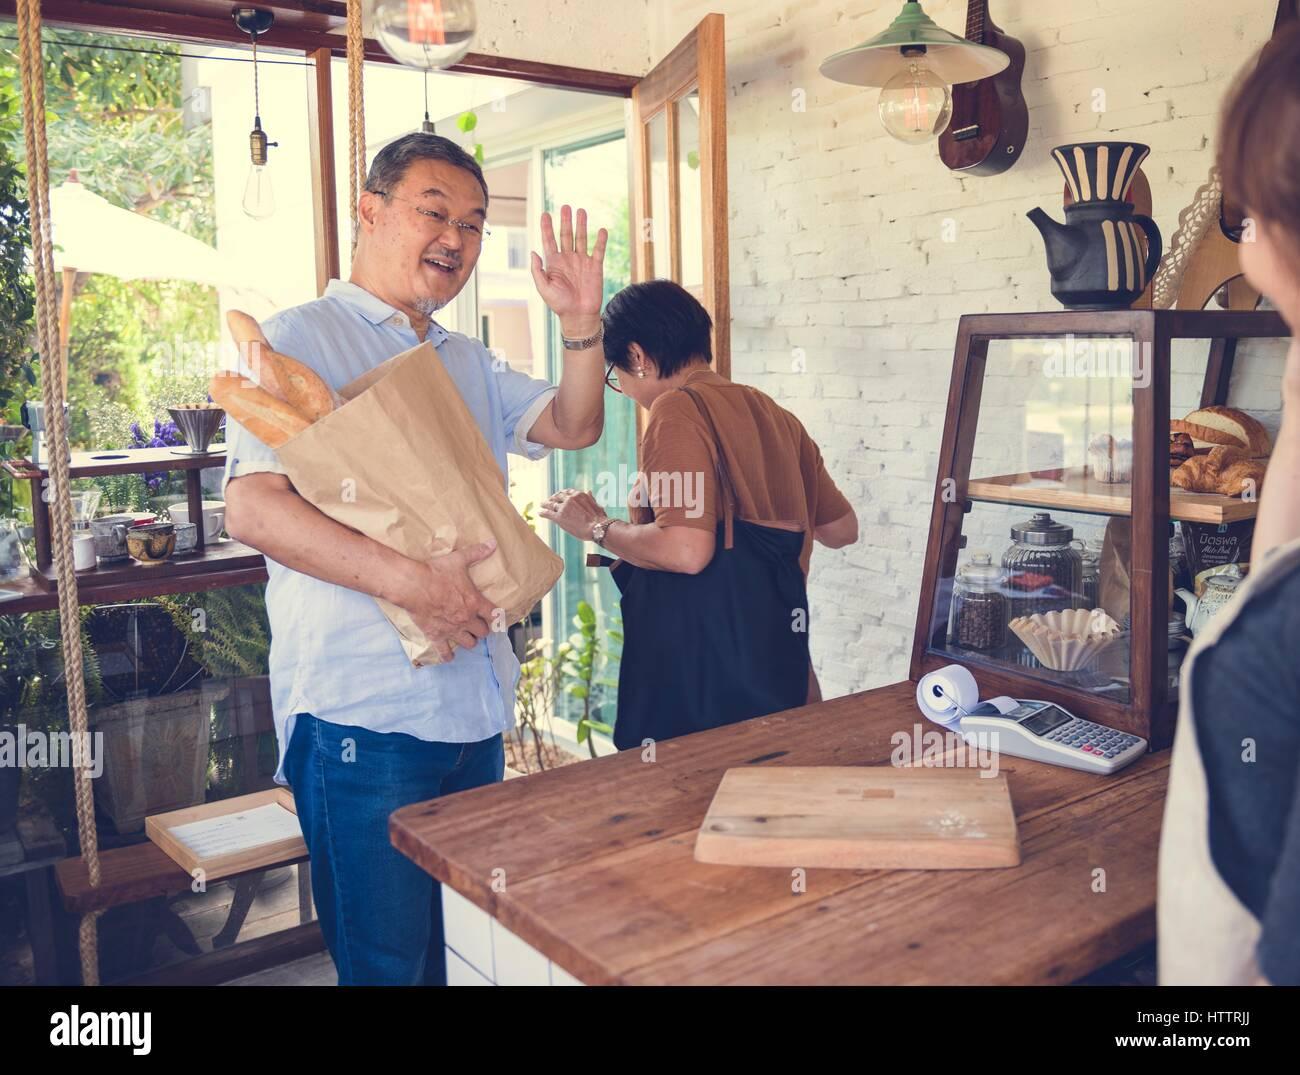 Customers bought bread waving goodbye - Stock Image